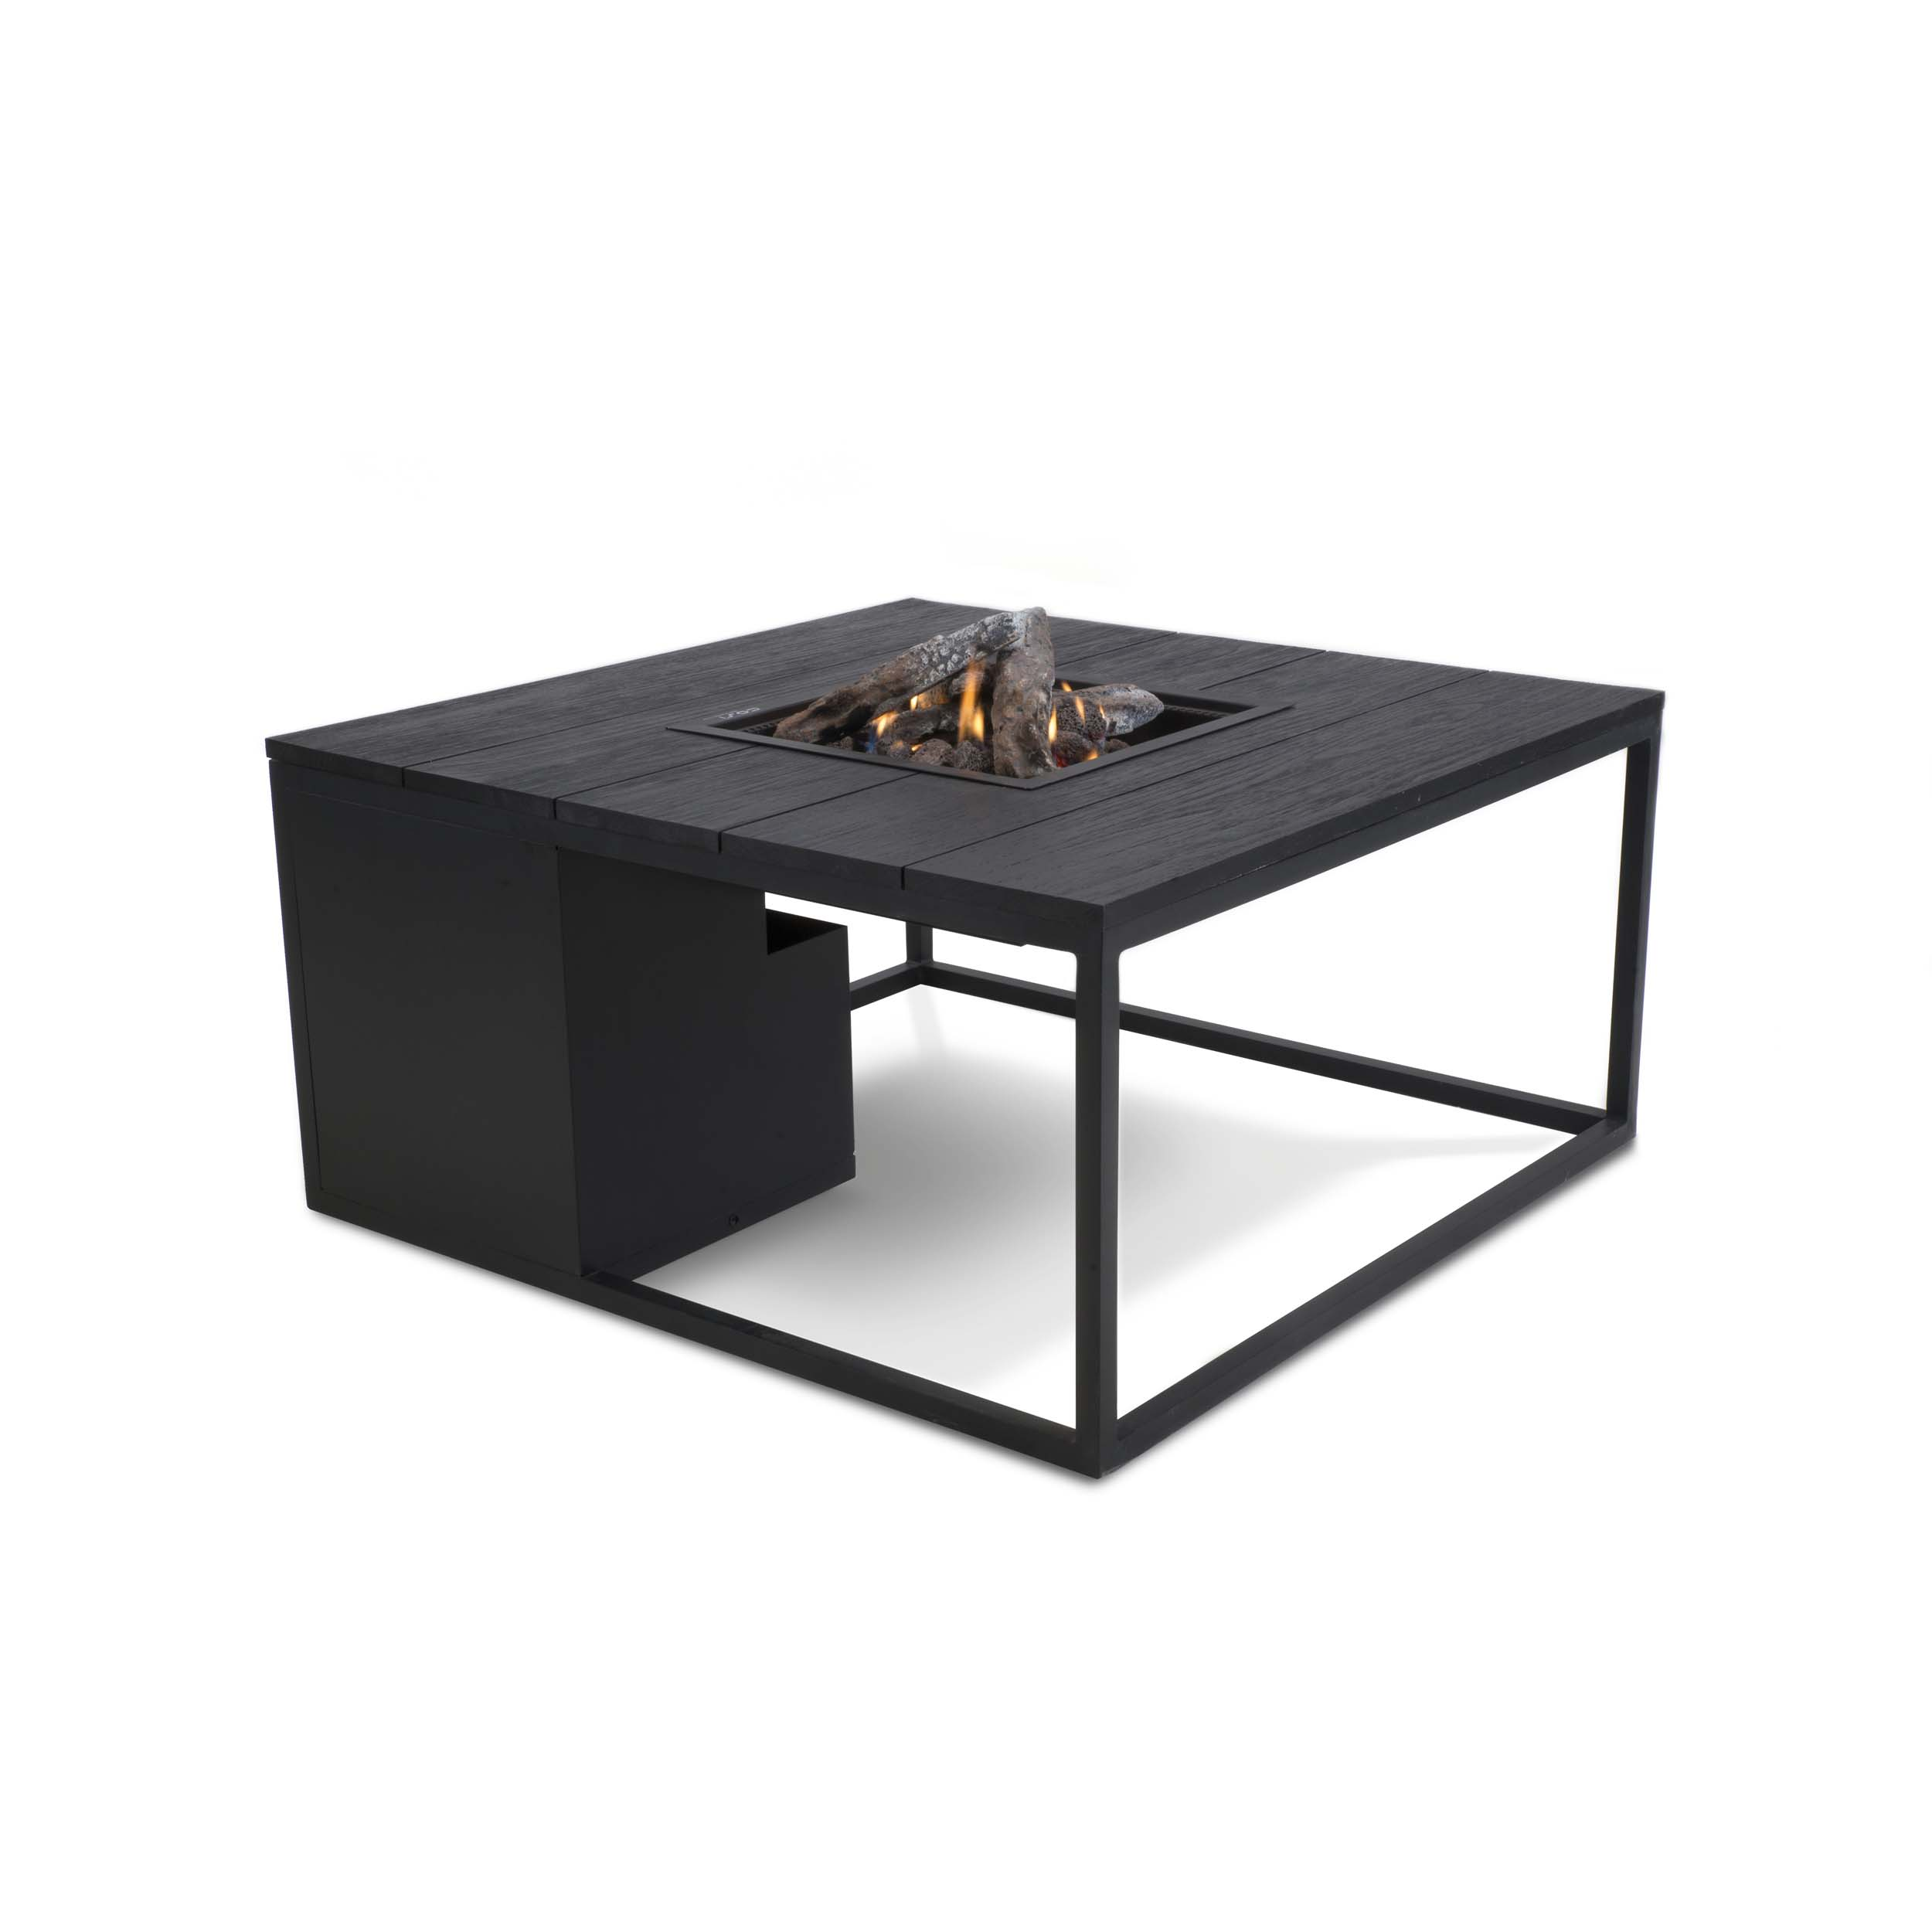 Cosiloft loungebord med gasbrænder – 100x100x47 – sort/sort